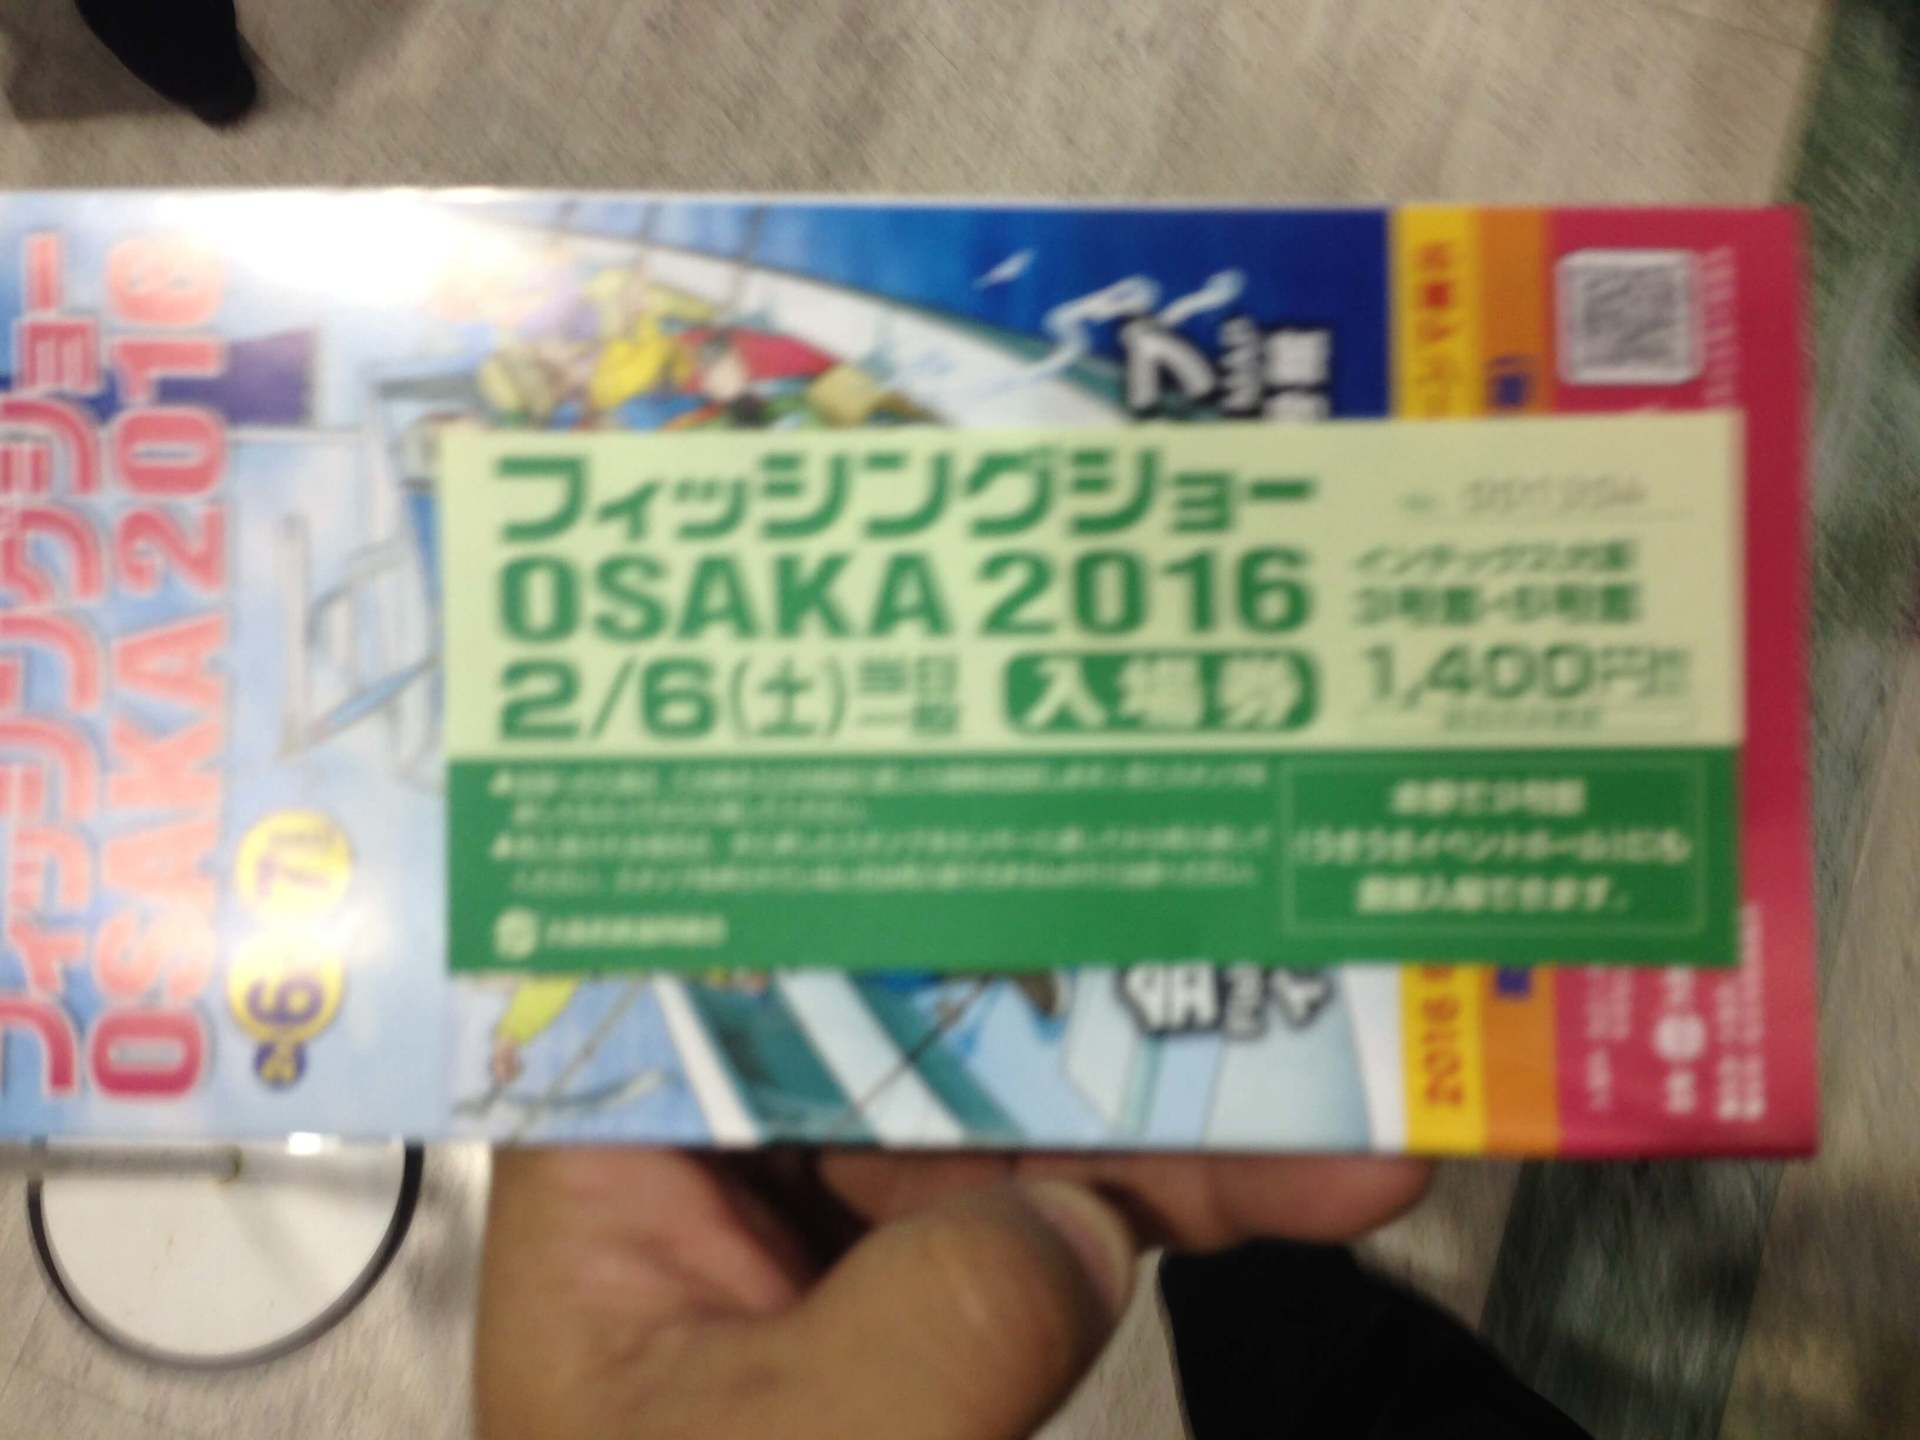 5A8A339E-5496-4766-9590-EA26C5D818C8.JPG